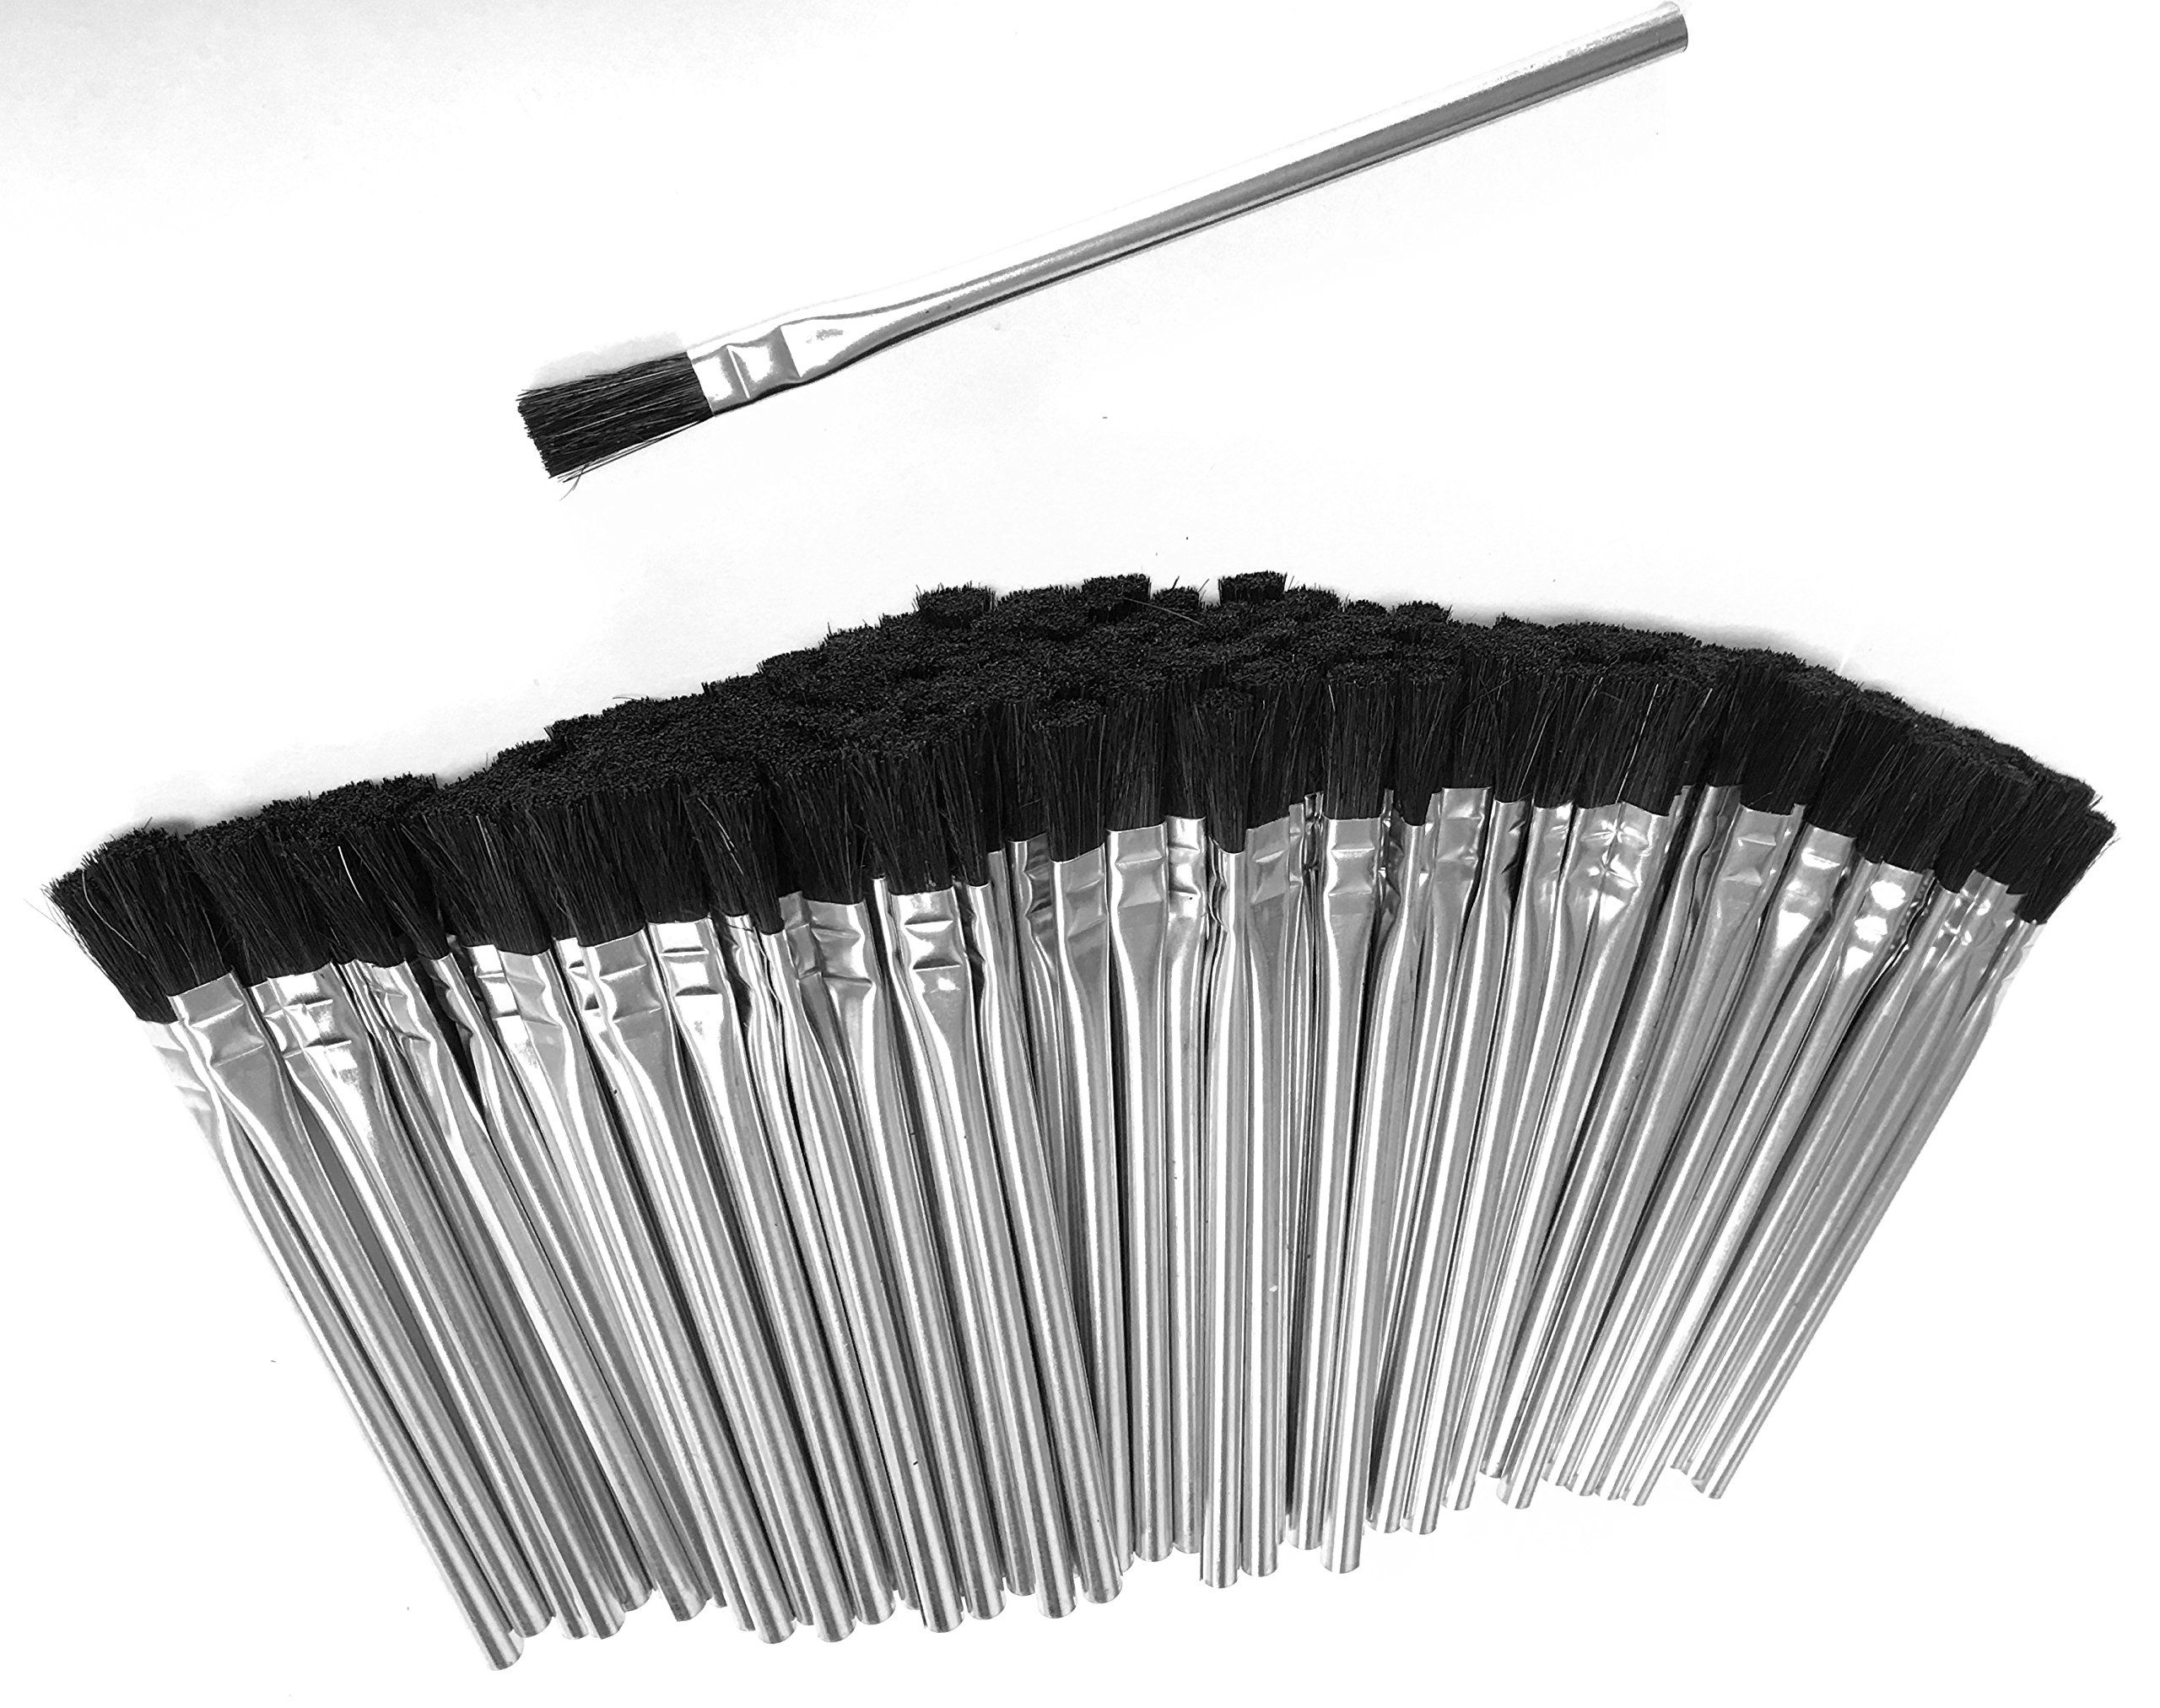 150pc ALAZCO 6'' Long 3/8'' Acid Brushes Natural Flexible Horsehair Bristles - Tin (Metal) Tubular Handles & Ferrules Home School Work Shop Garage by ALAZCO (Image #2)